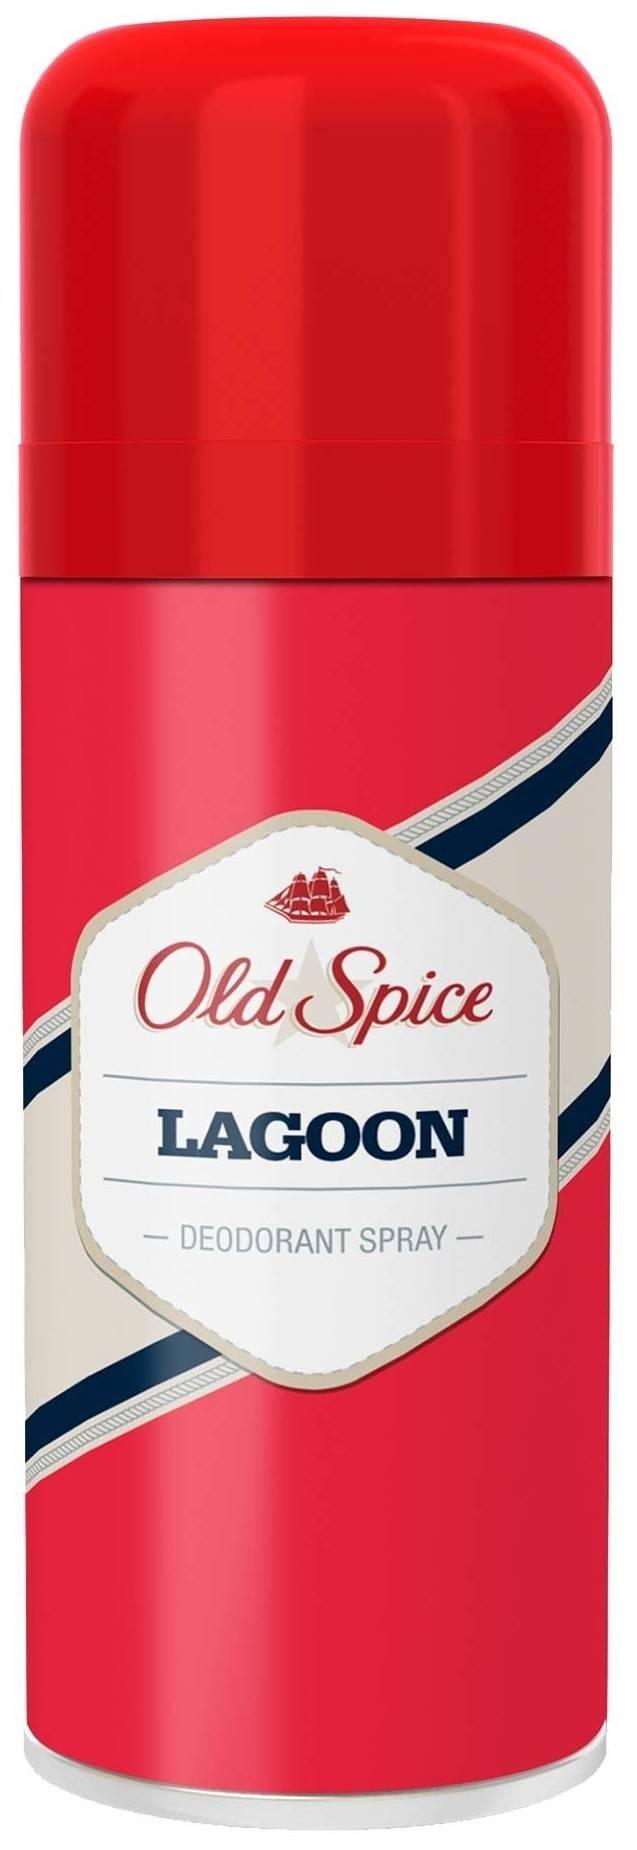 OLD SPICE DEO SPRAY LAGOON 125ML thumbnail